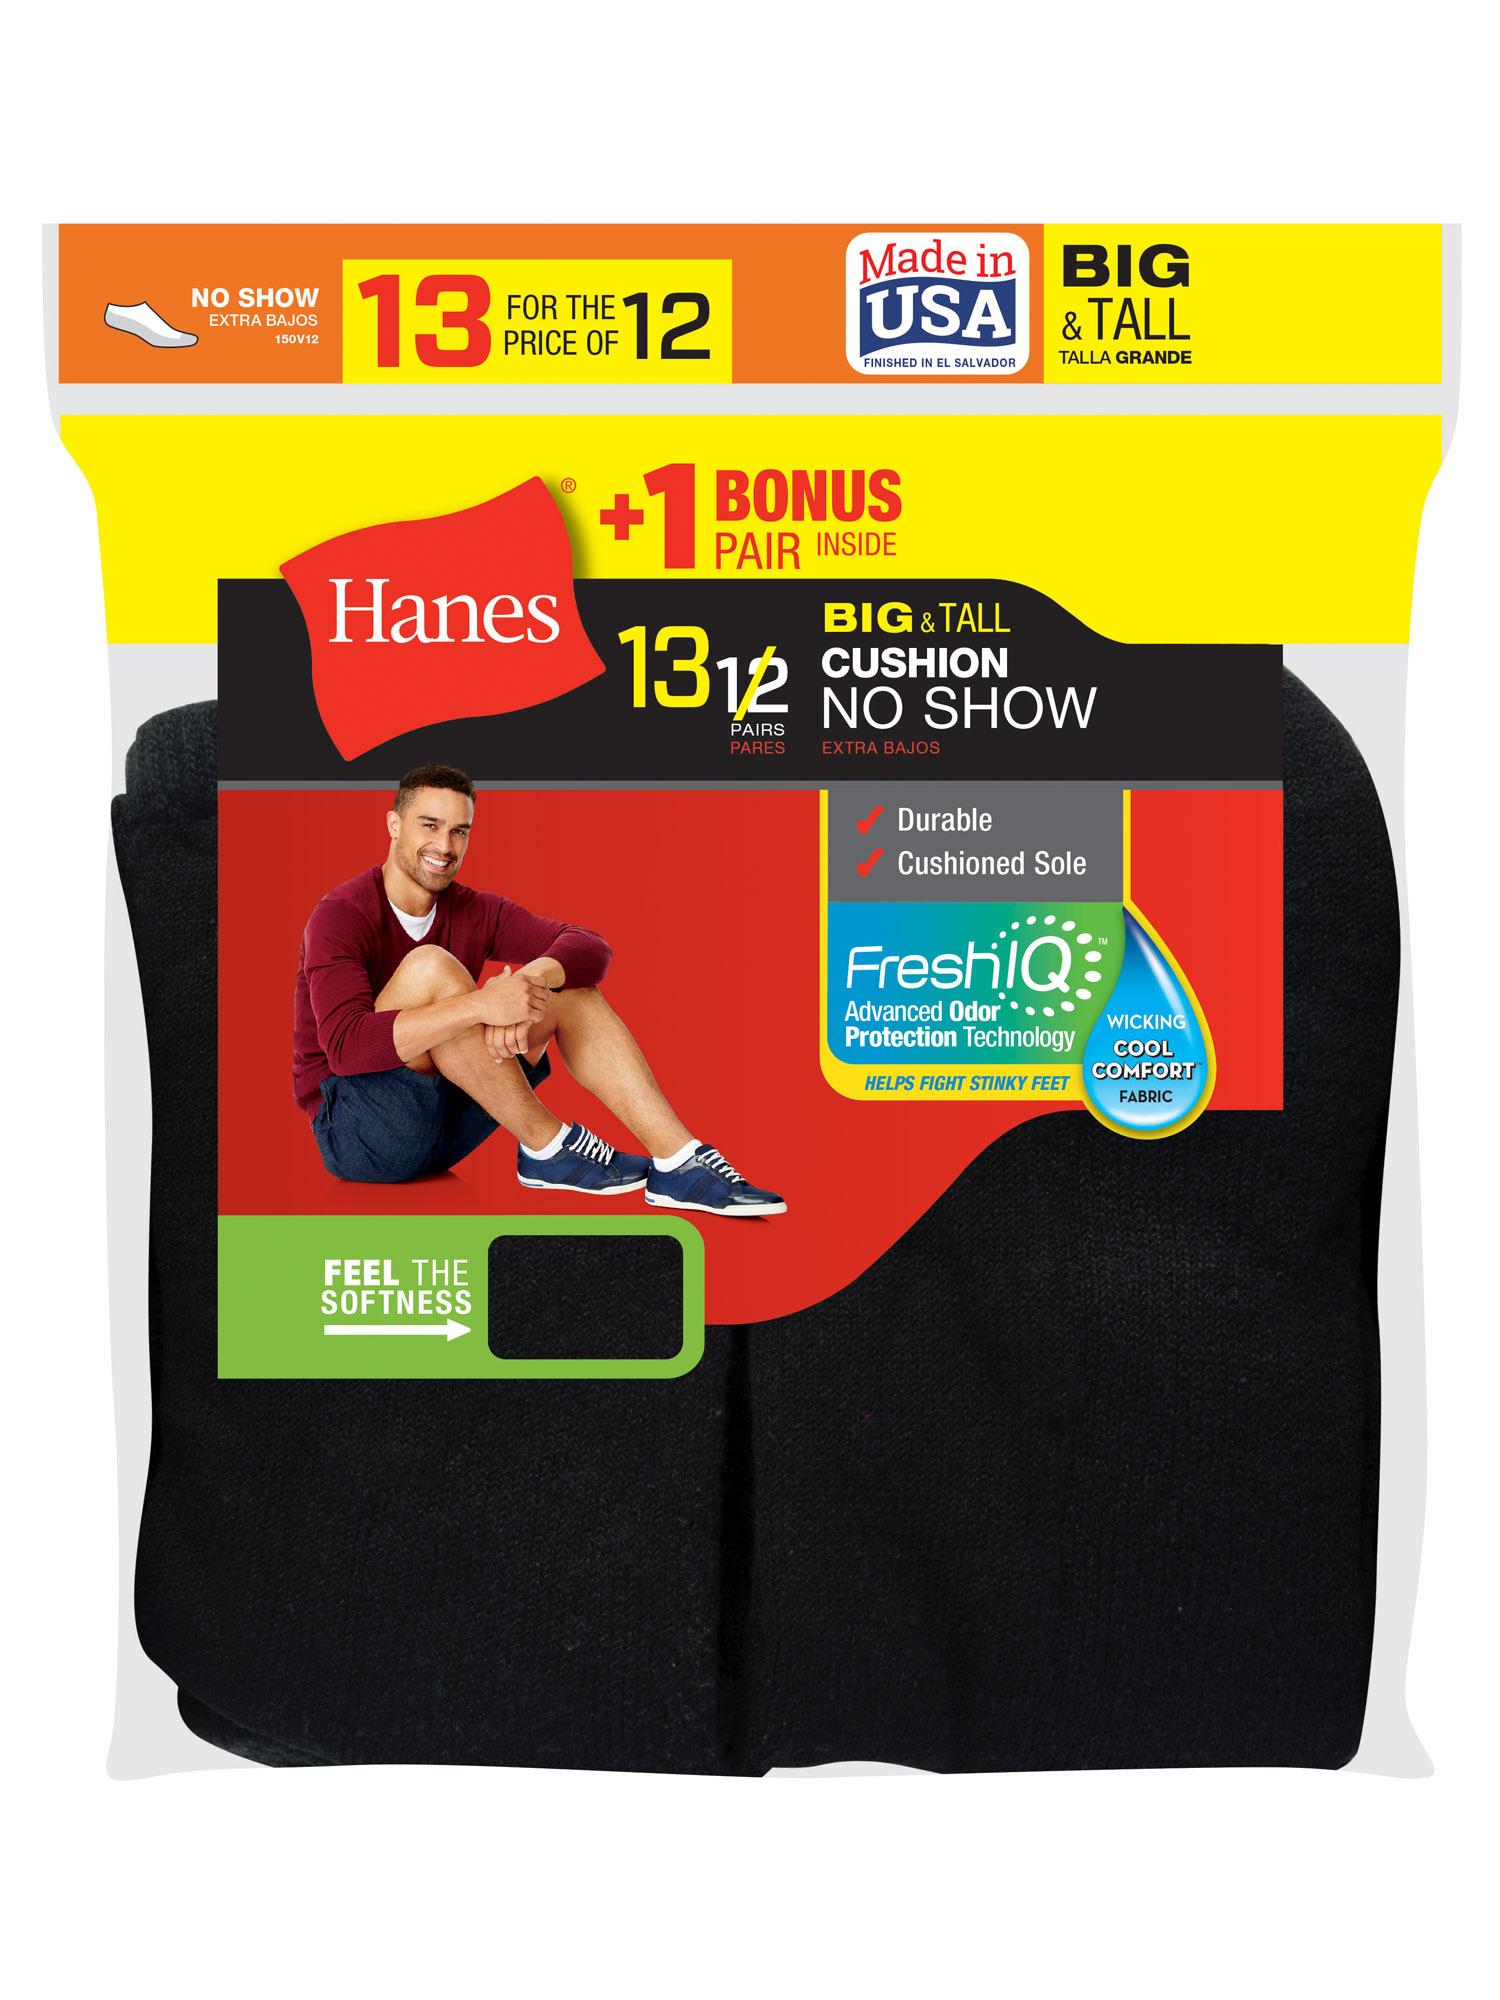 Hanes Men's Big & Tall Cushion FreshIQ No Show Socks, 12 + 1 Bonus Pack